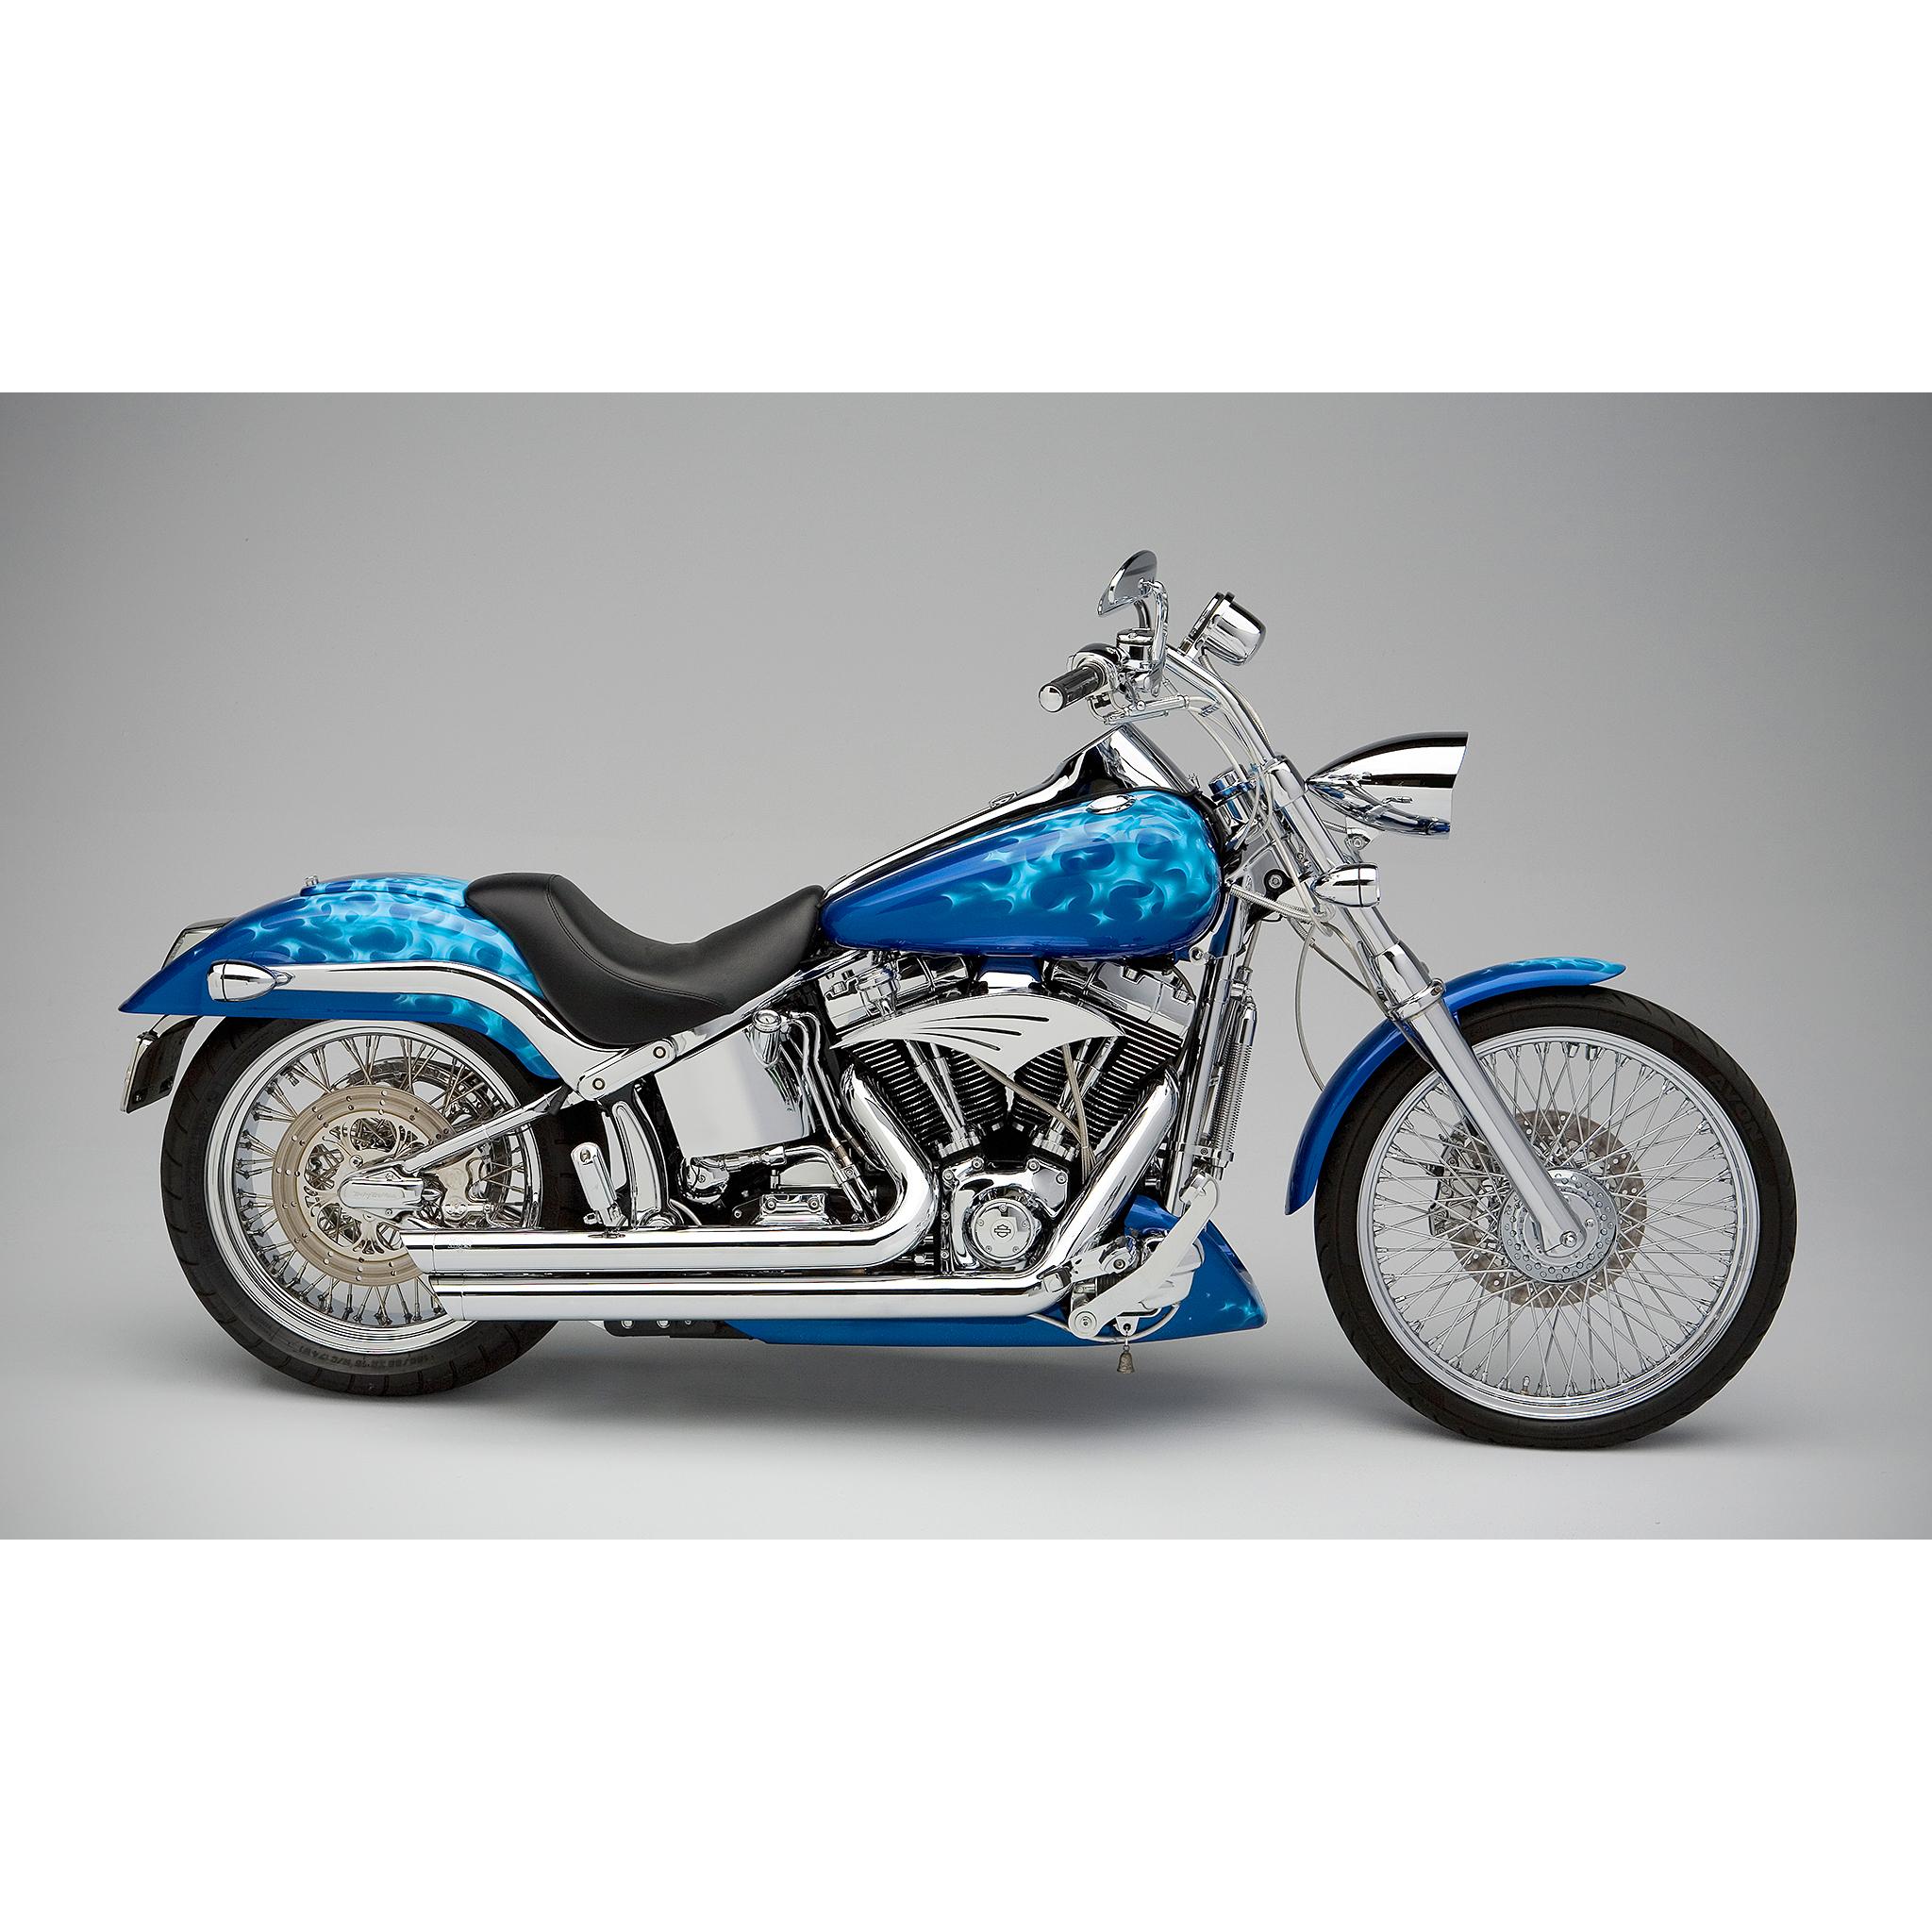 Blue custom motorcycle photographed in studio